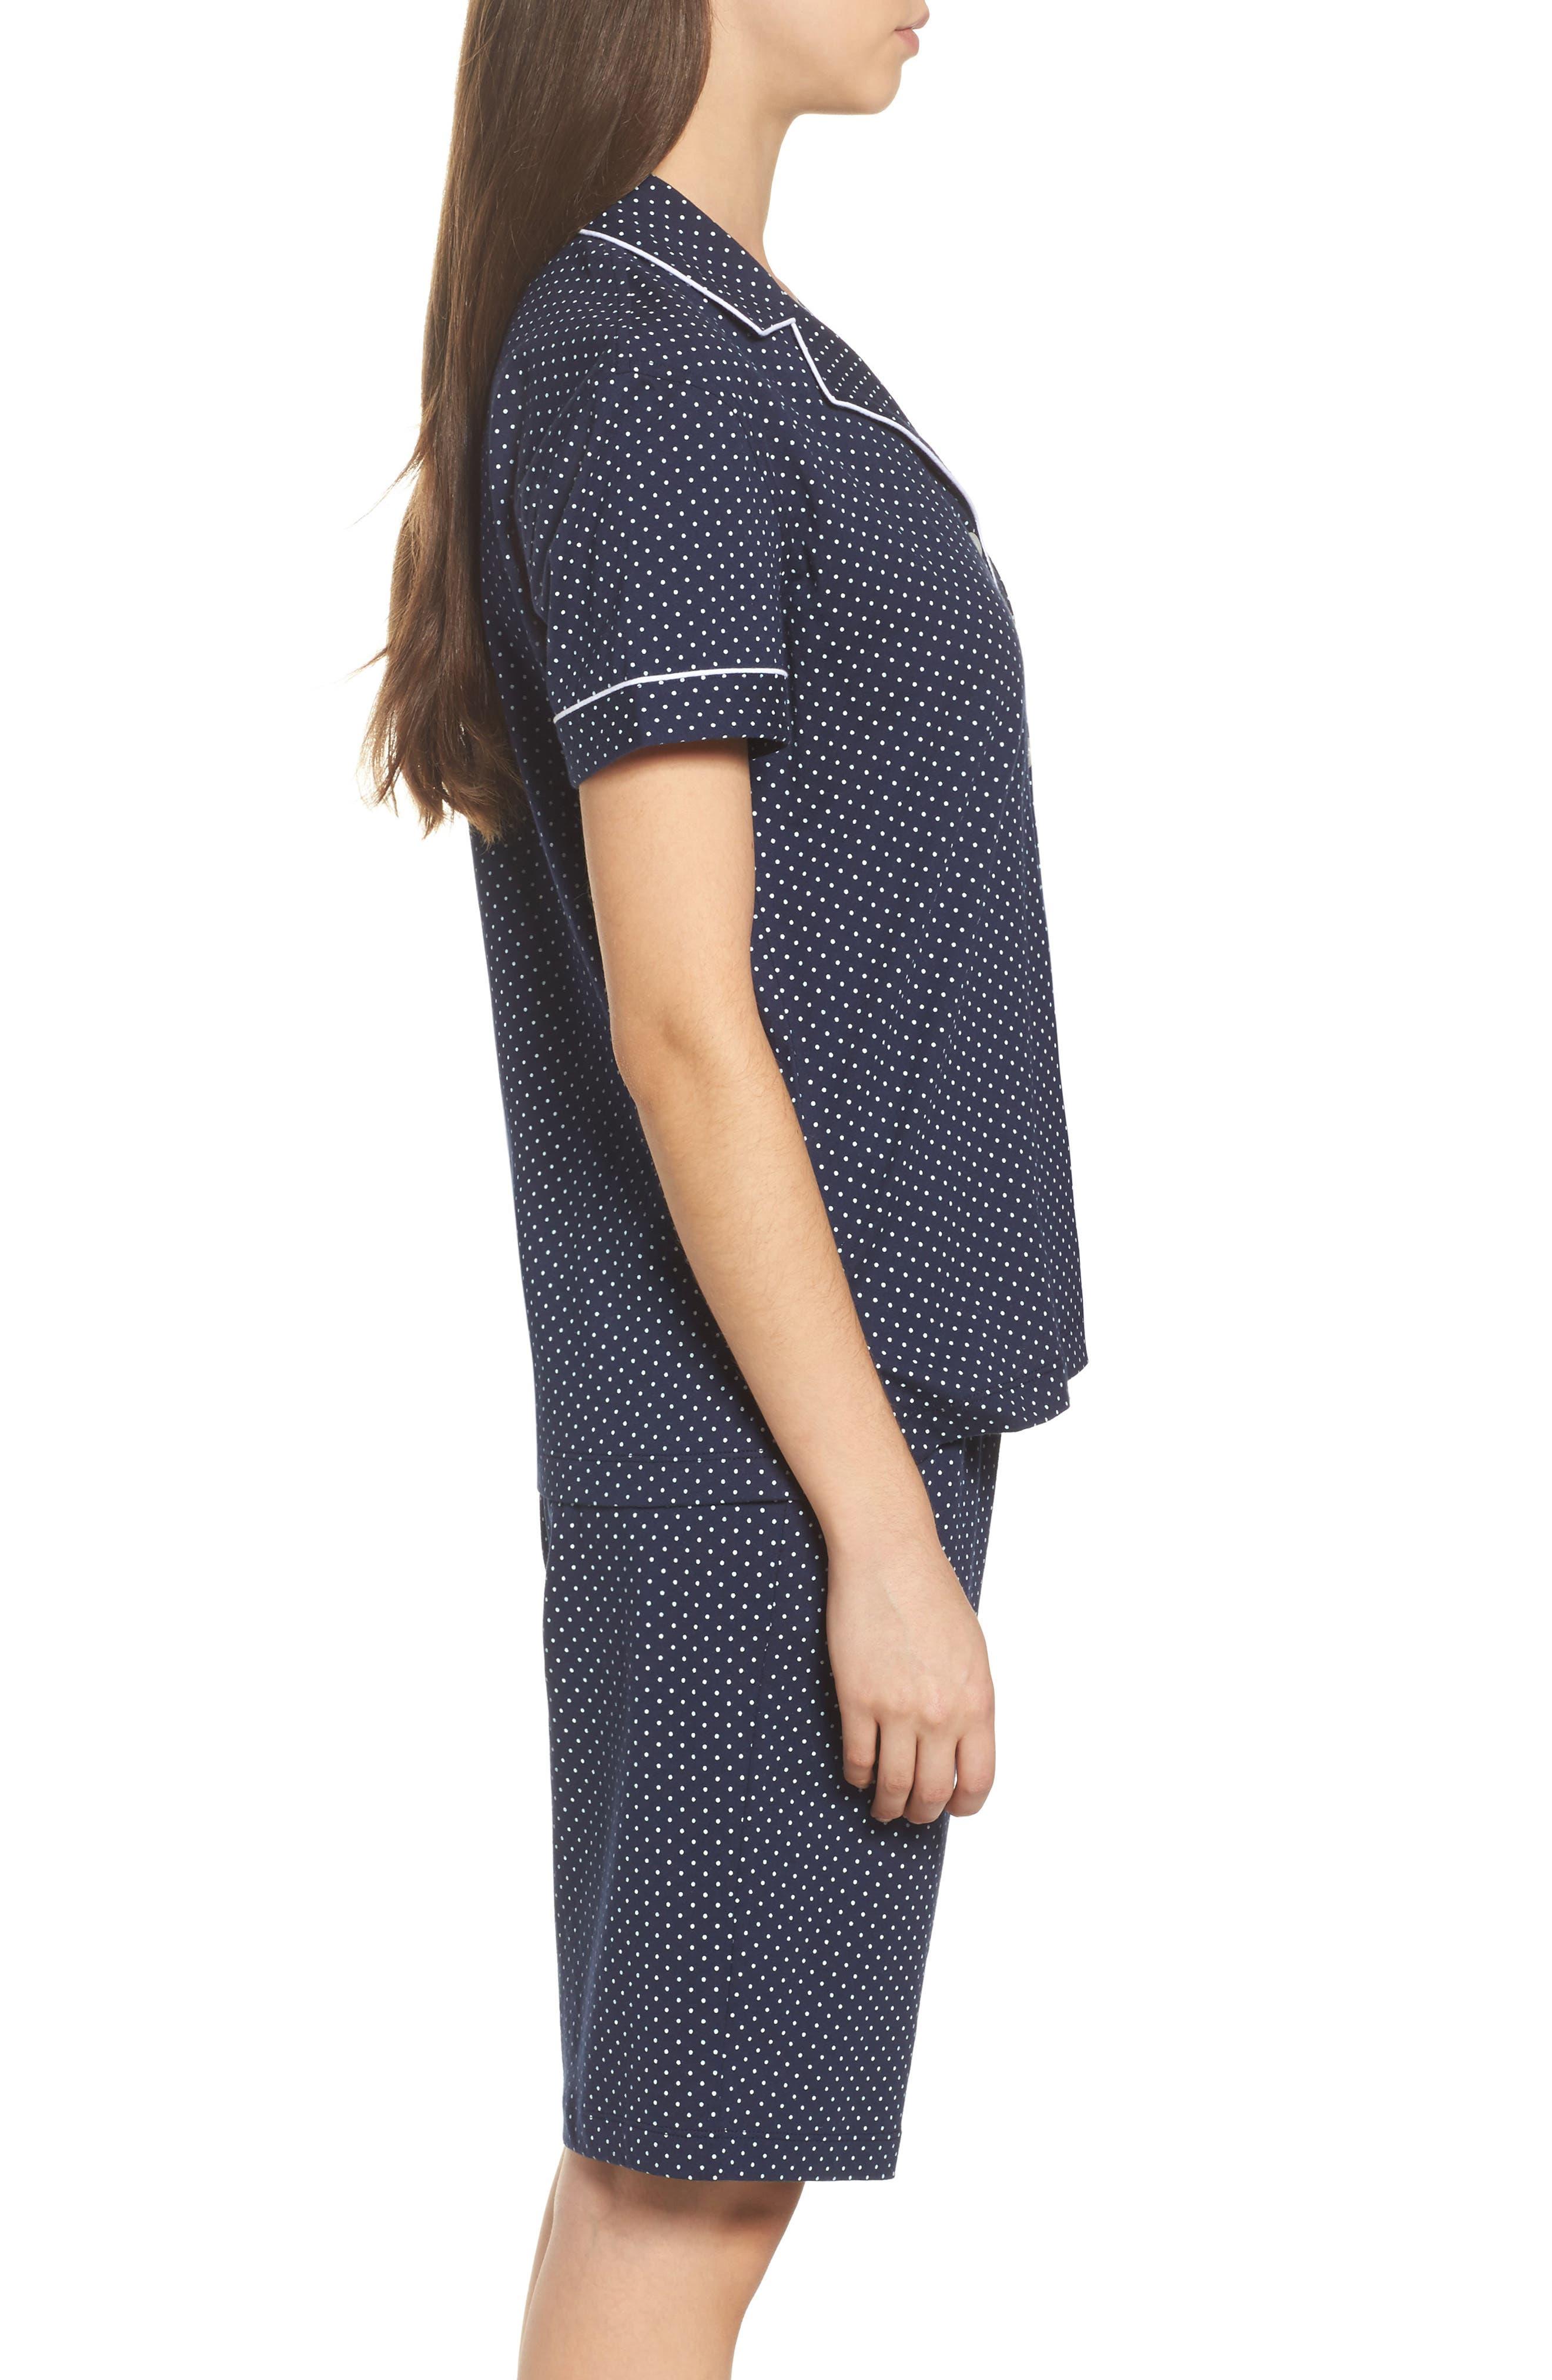 Bermuda Pajamas,                             Alternate thumbnail 3, color,                             Navy Dot